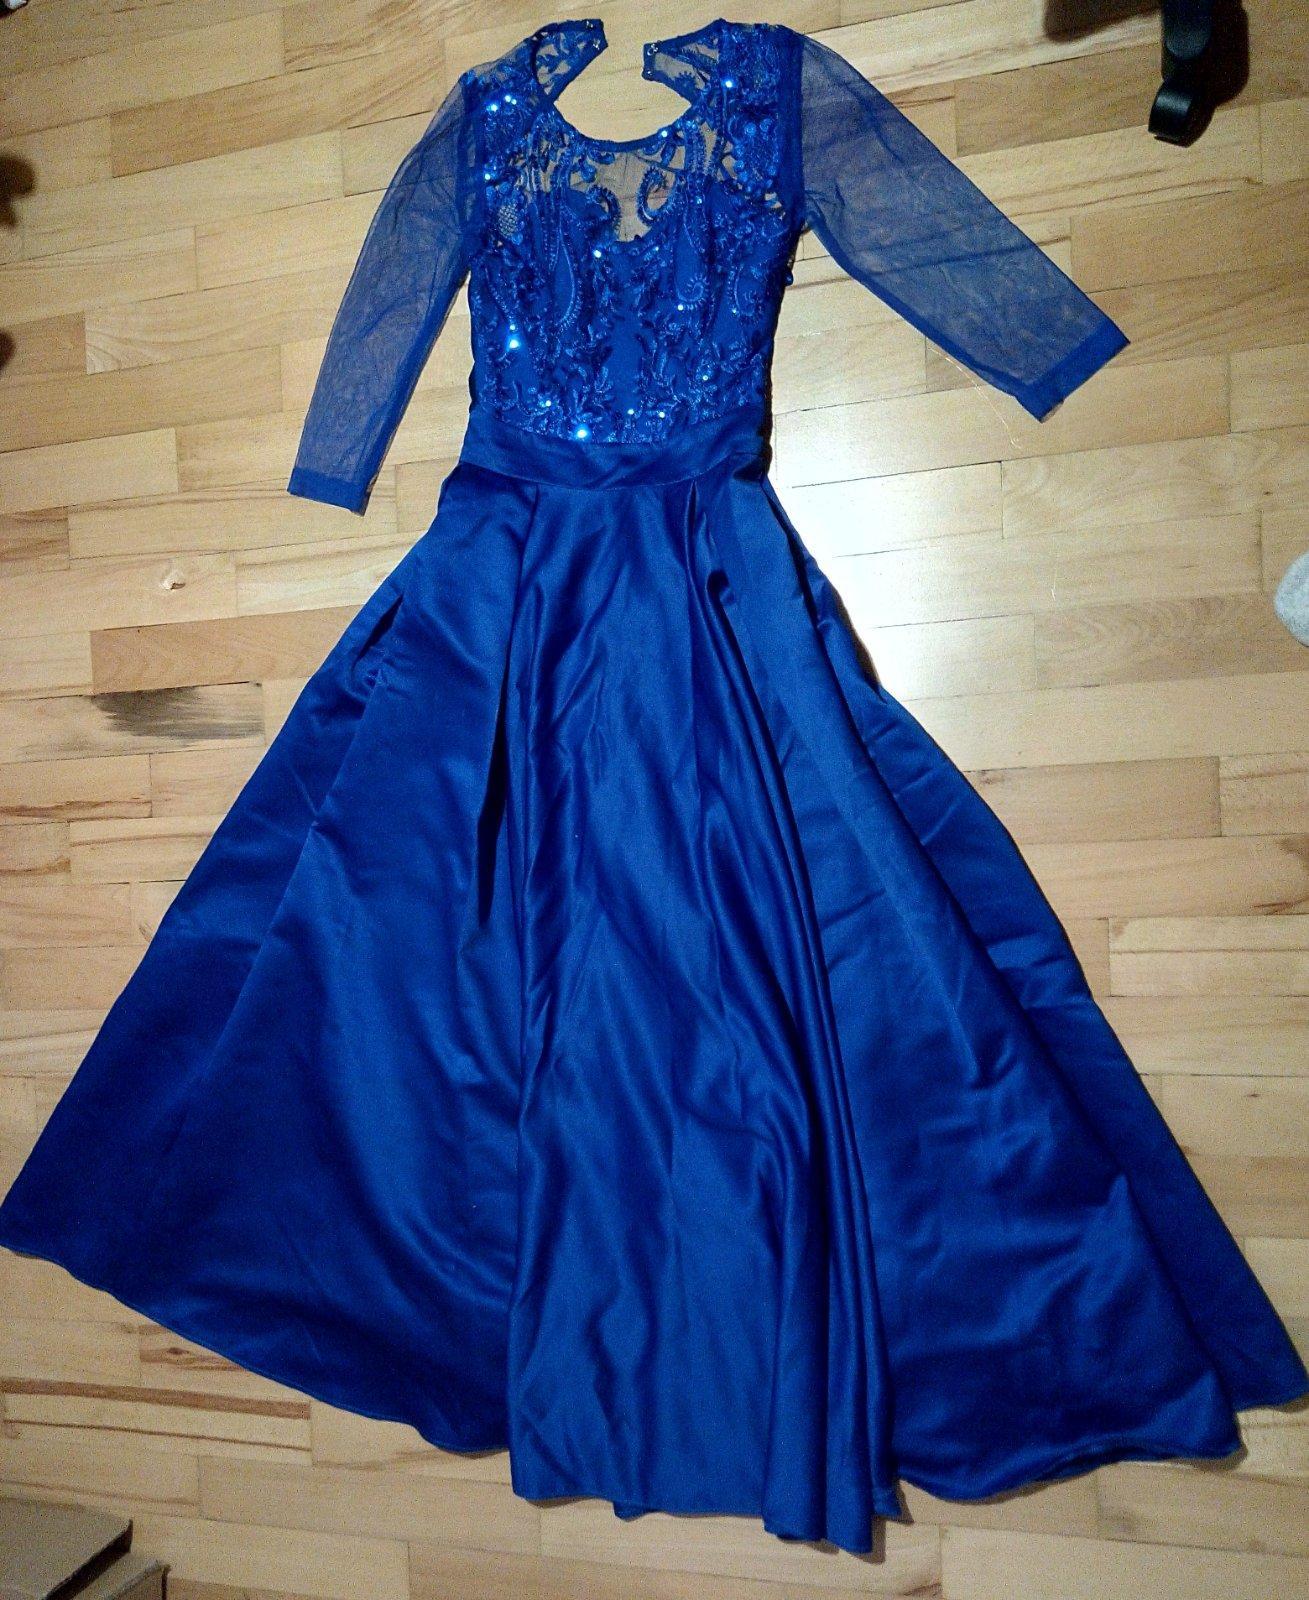 Kráľovsky modré spoločenské dlhé šaty XS - Obrázok č. 3